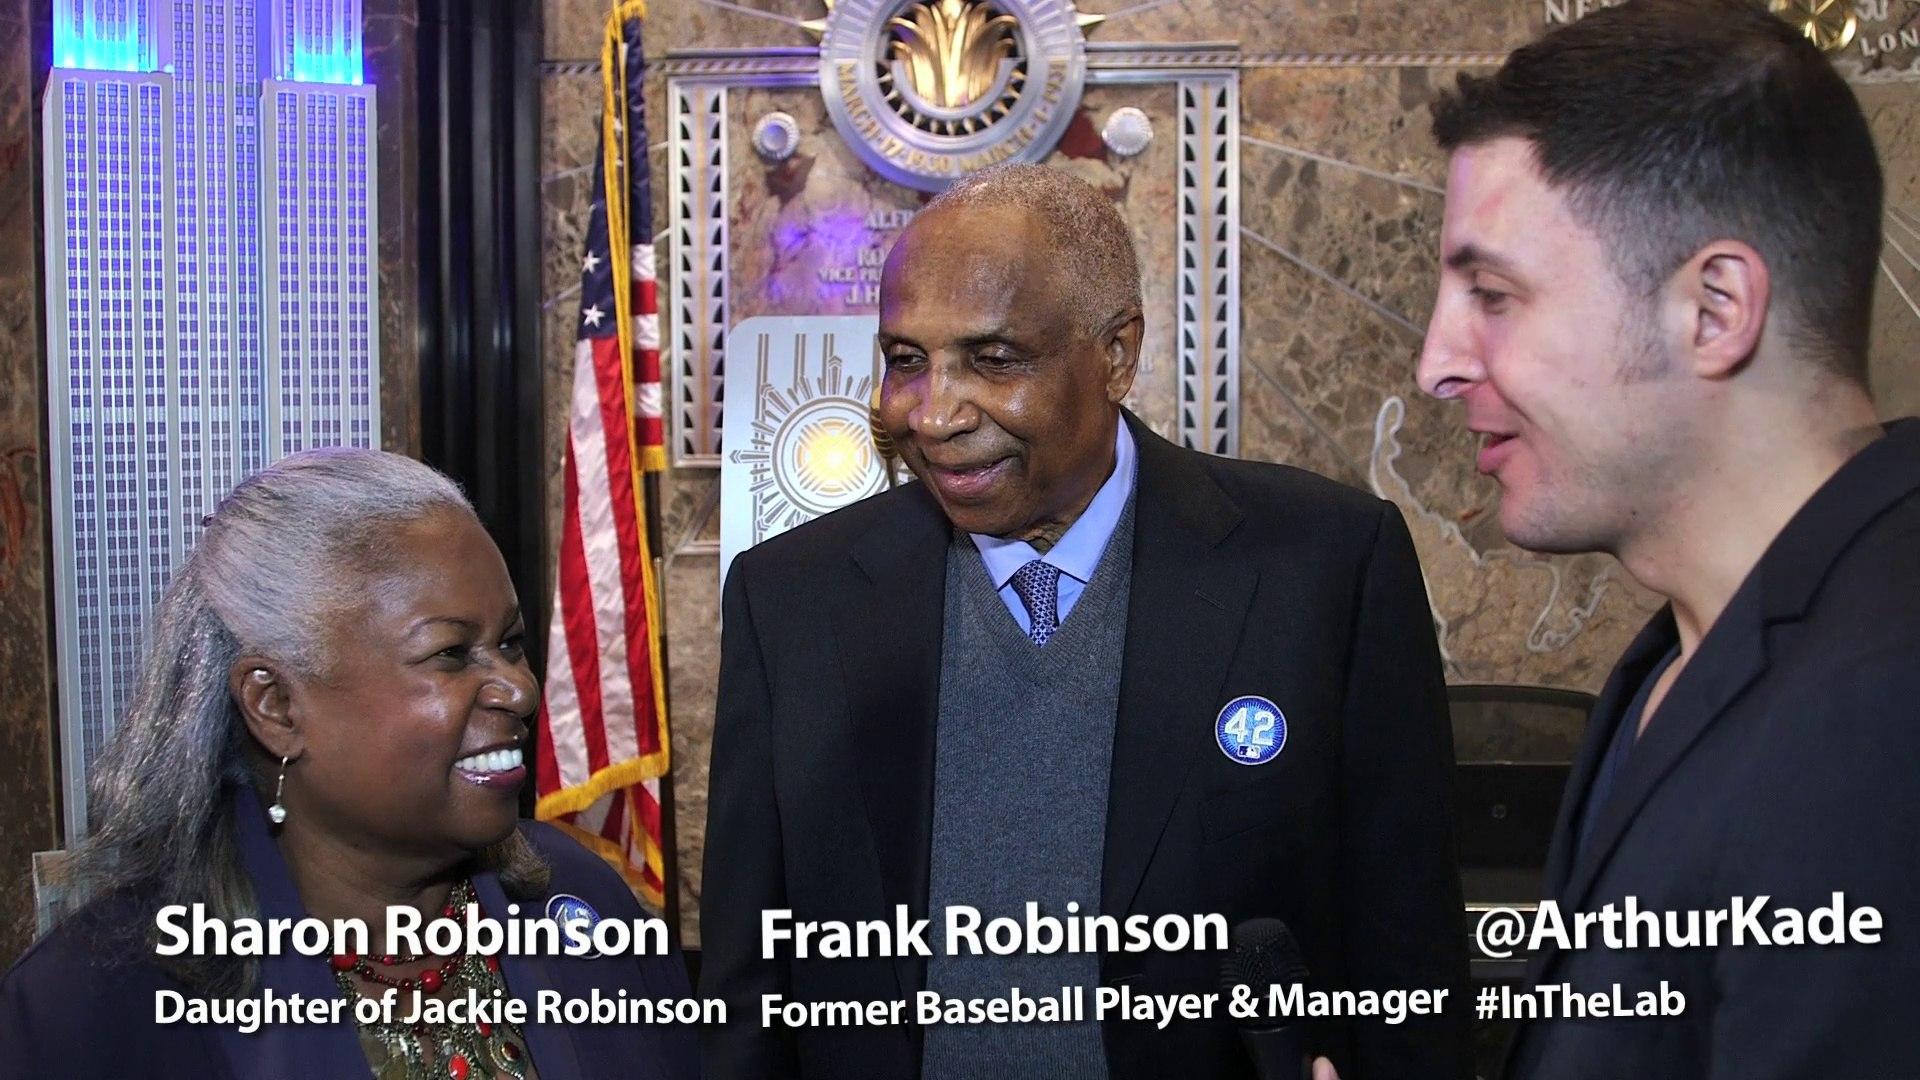 Frank Robinson & Jackie Robinson's Daughter Sharon Robinson